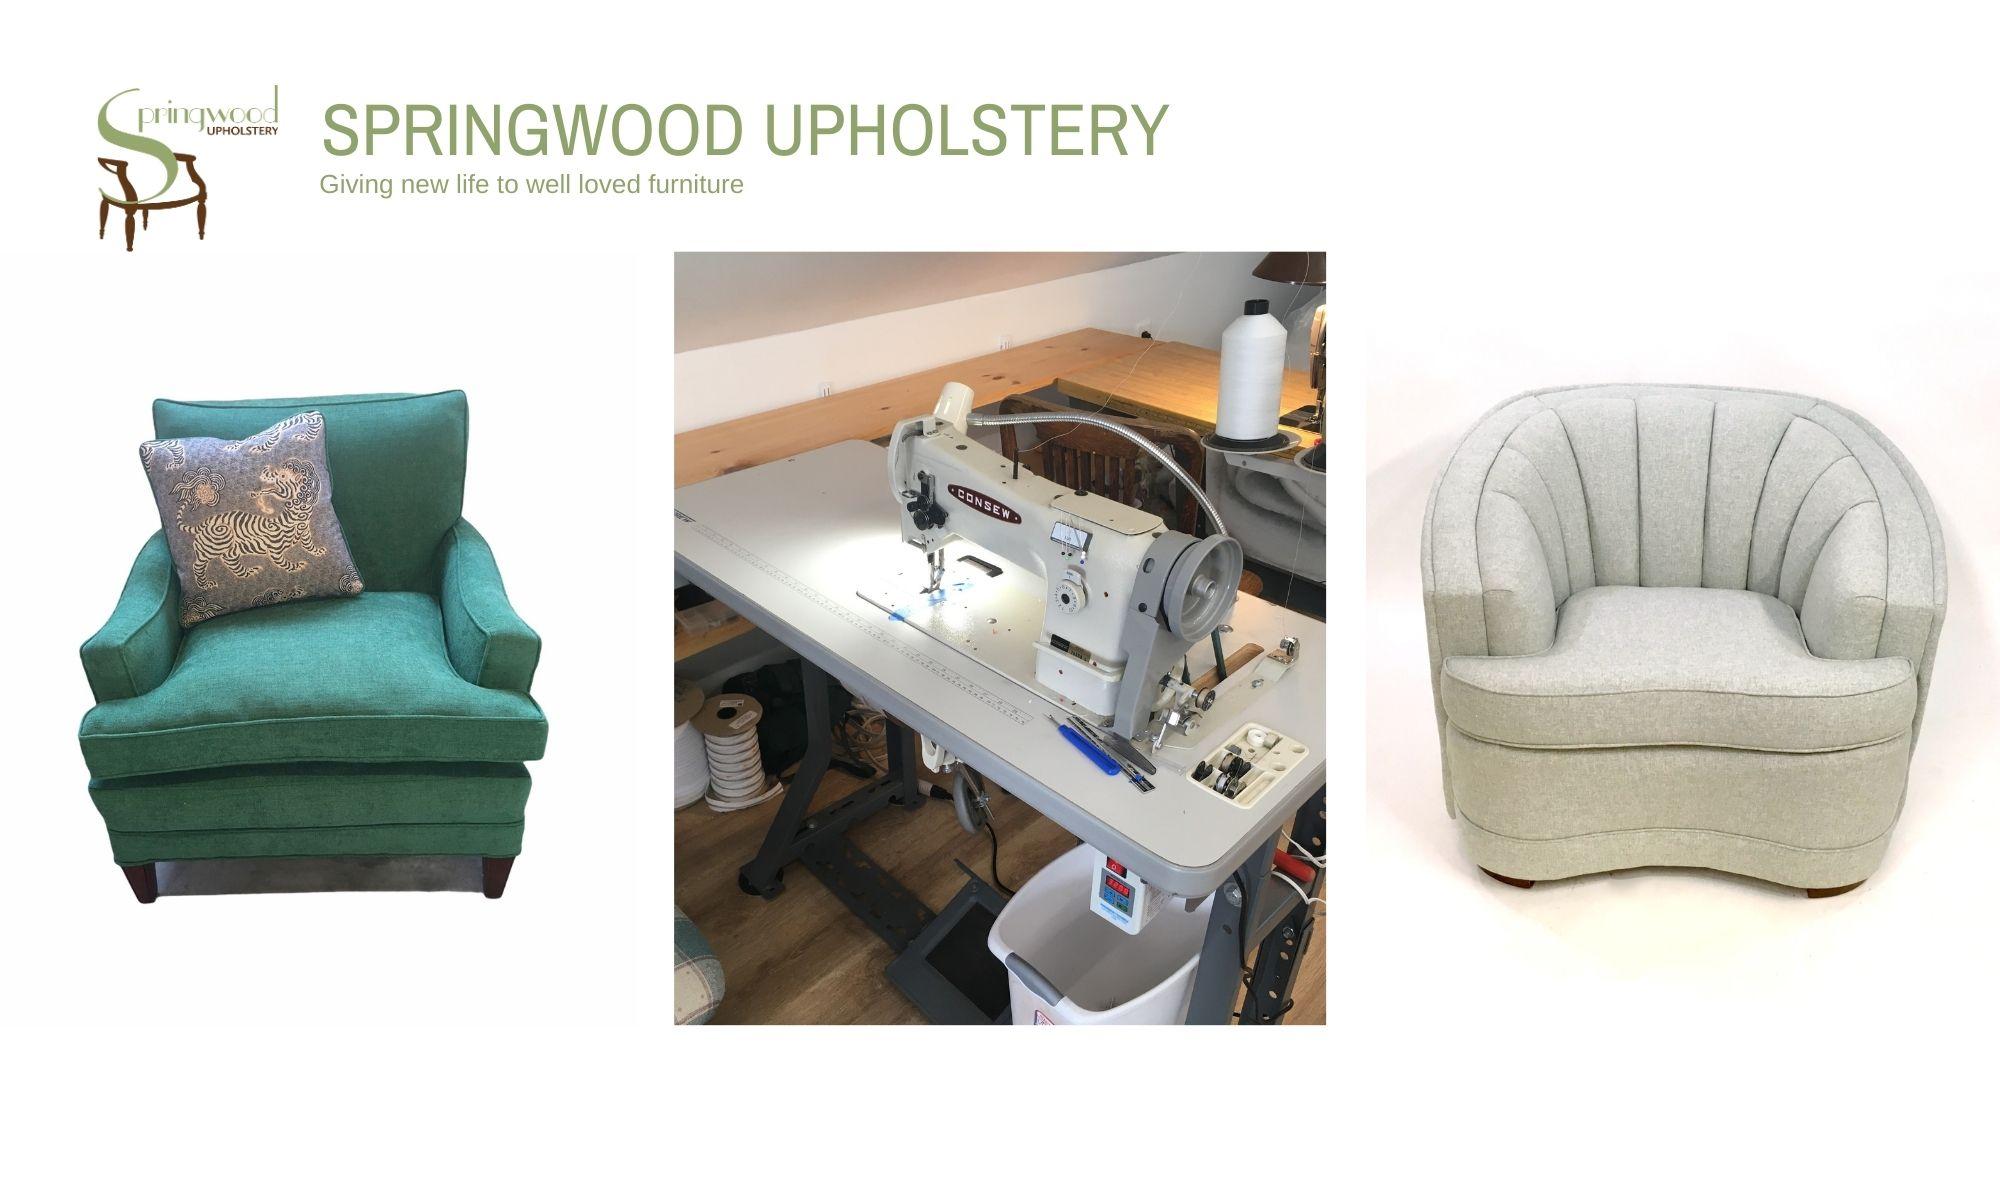 Springwood Upholstery